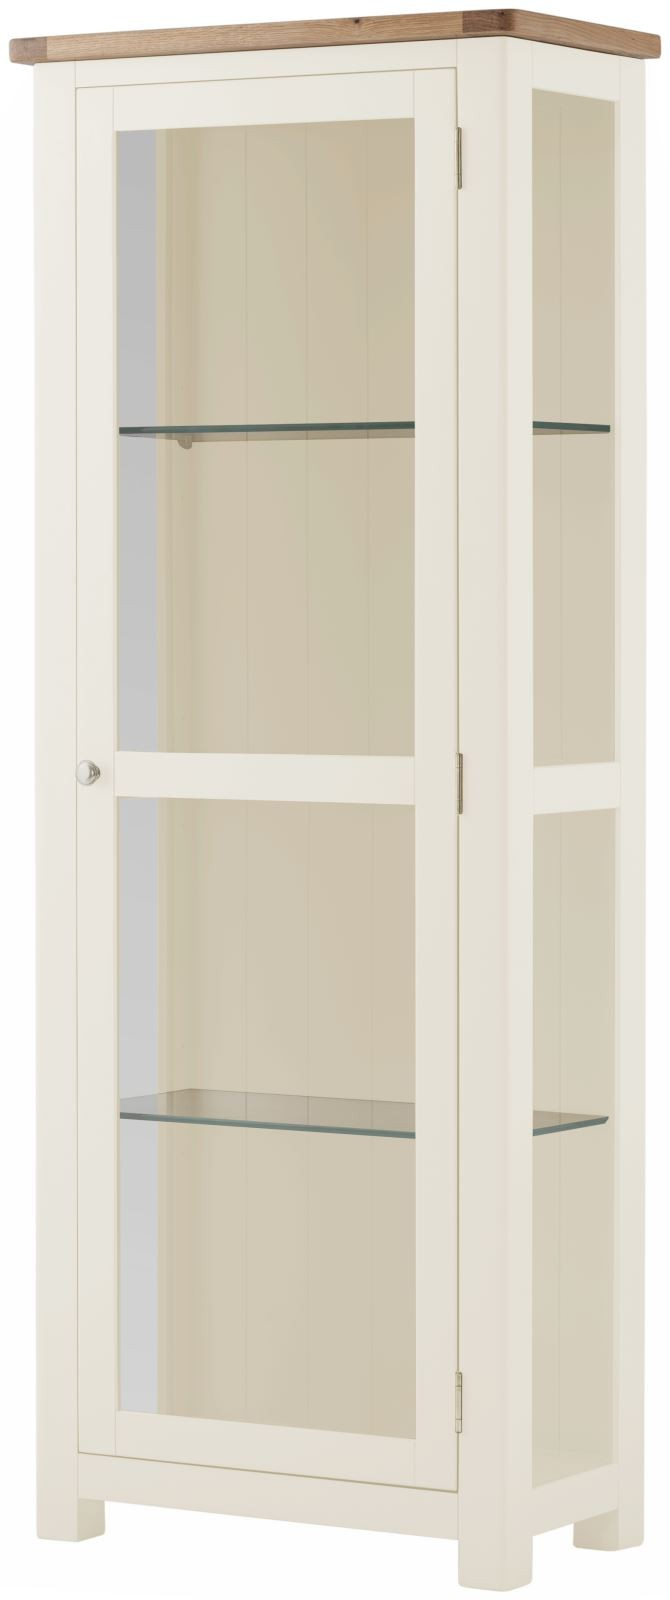 PRESTON Glazed Display Cabinet